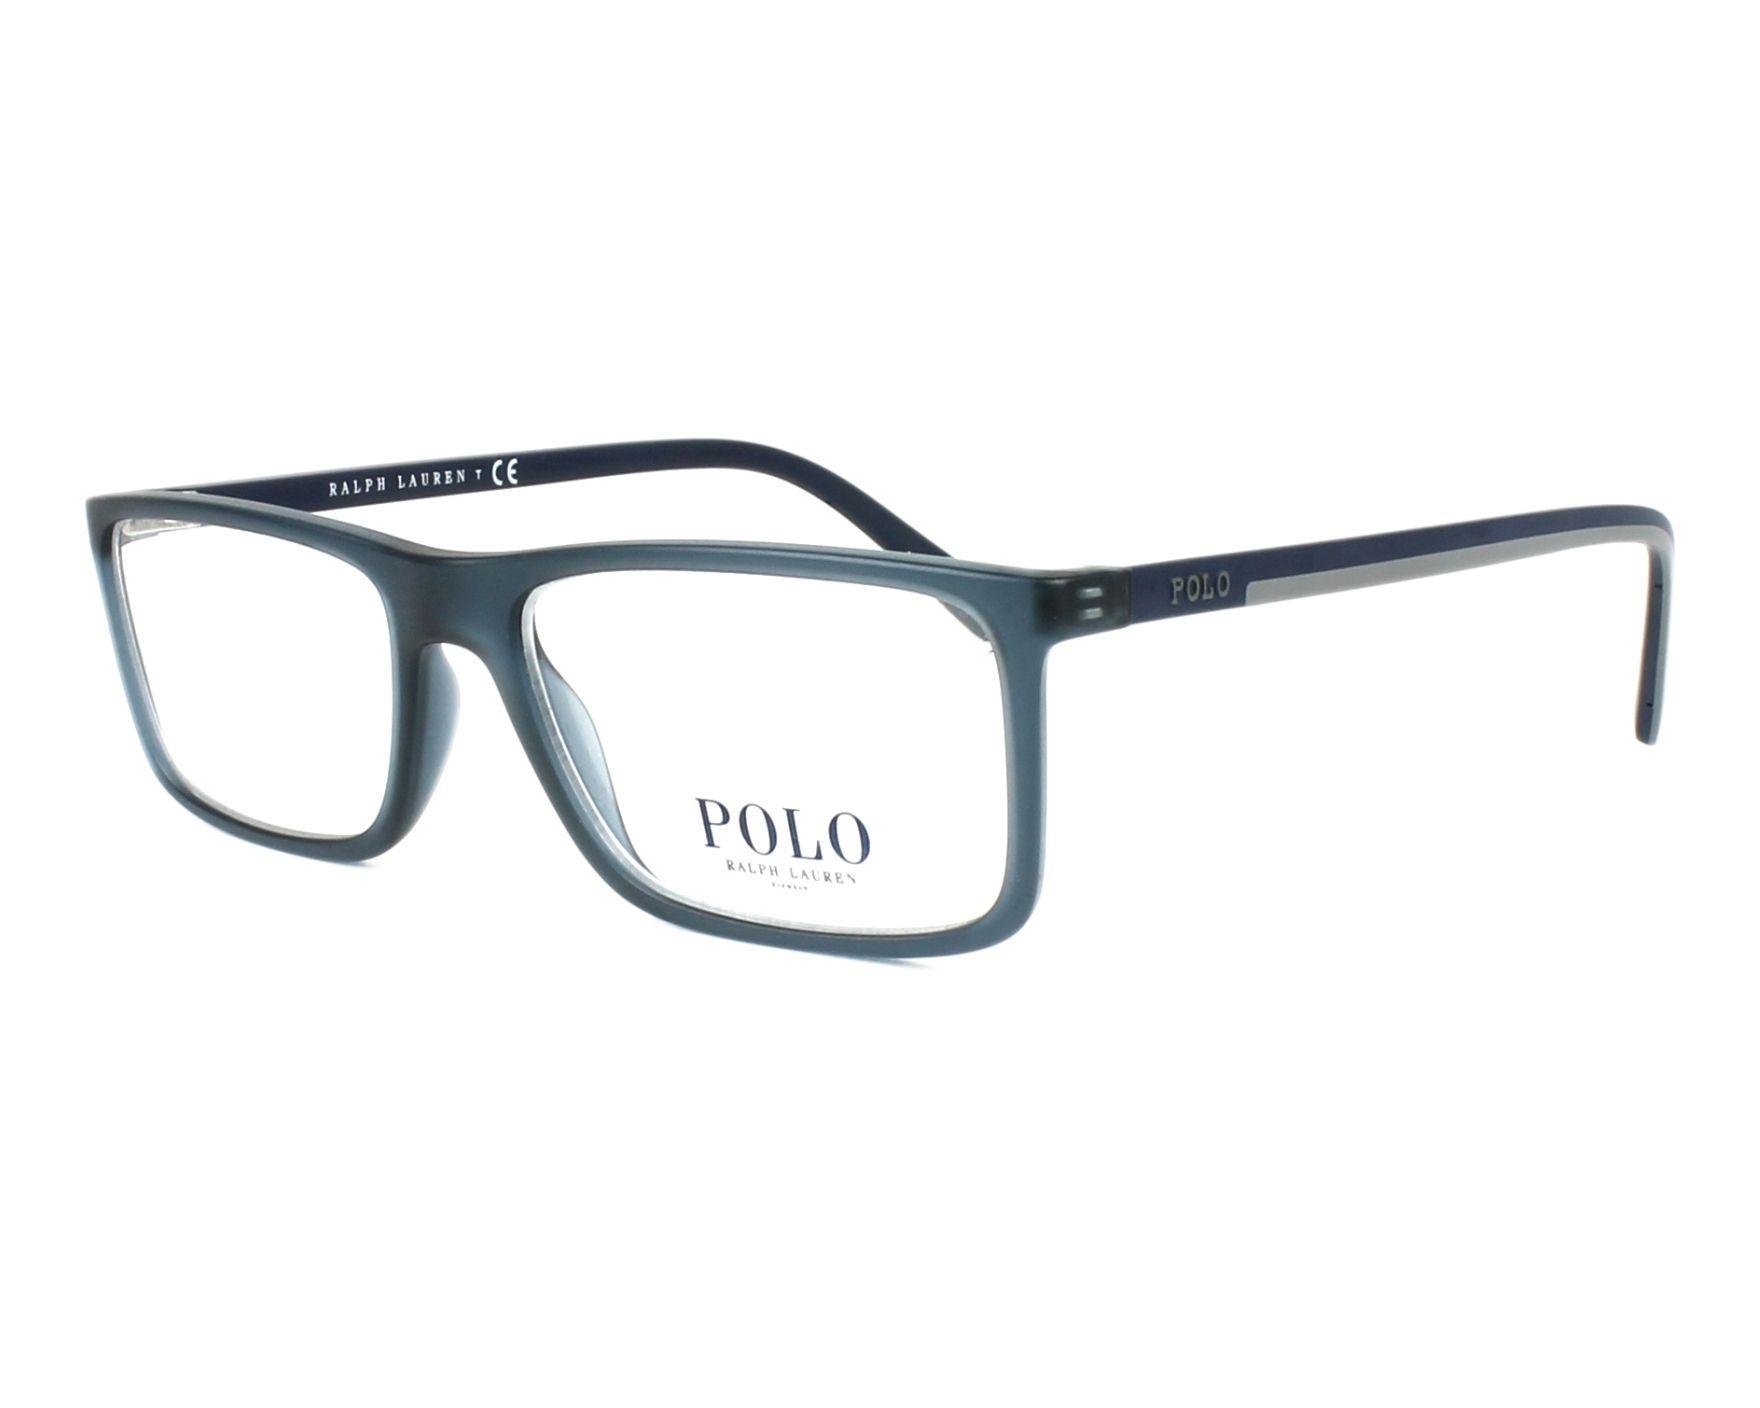 Polo Ralph Lauren PH-2178 5644